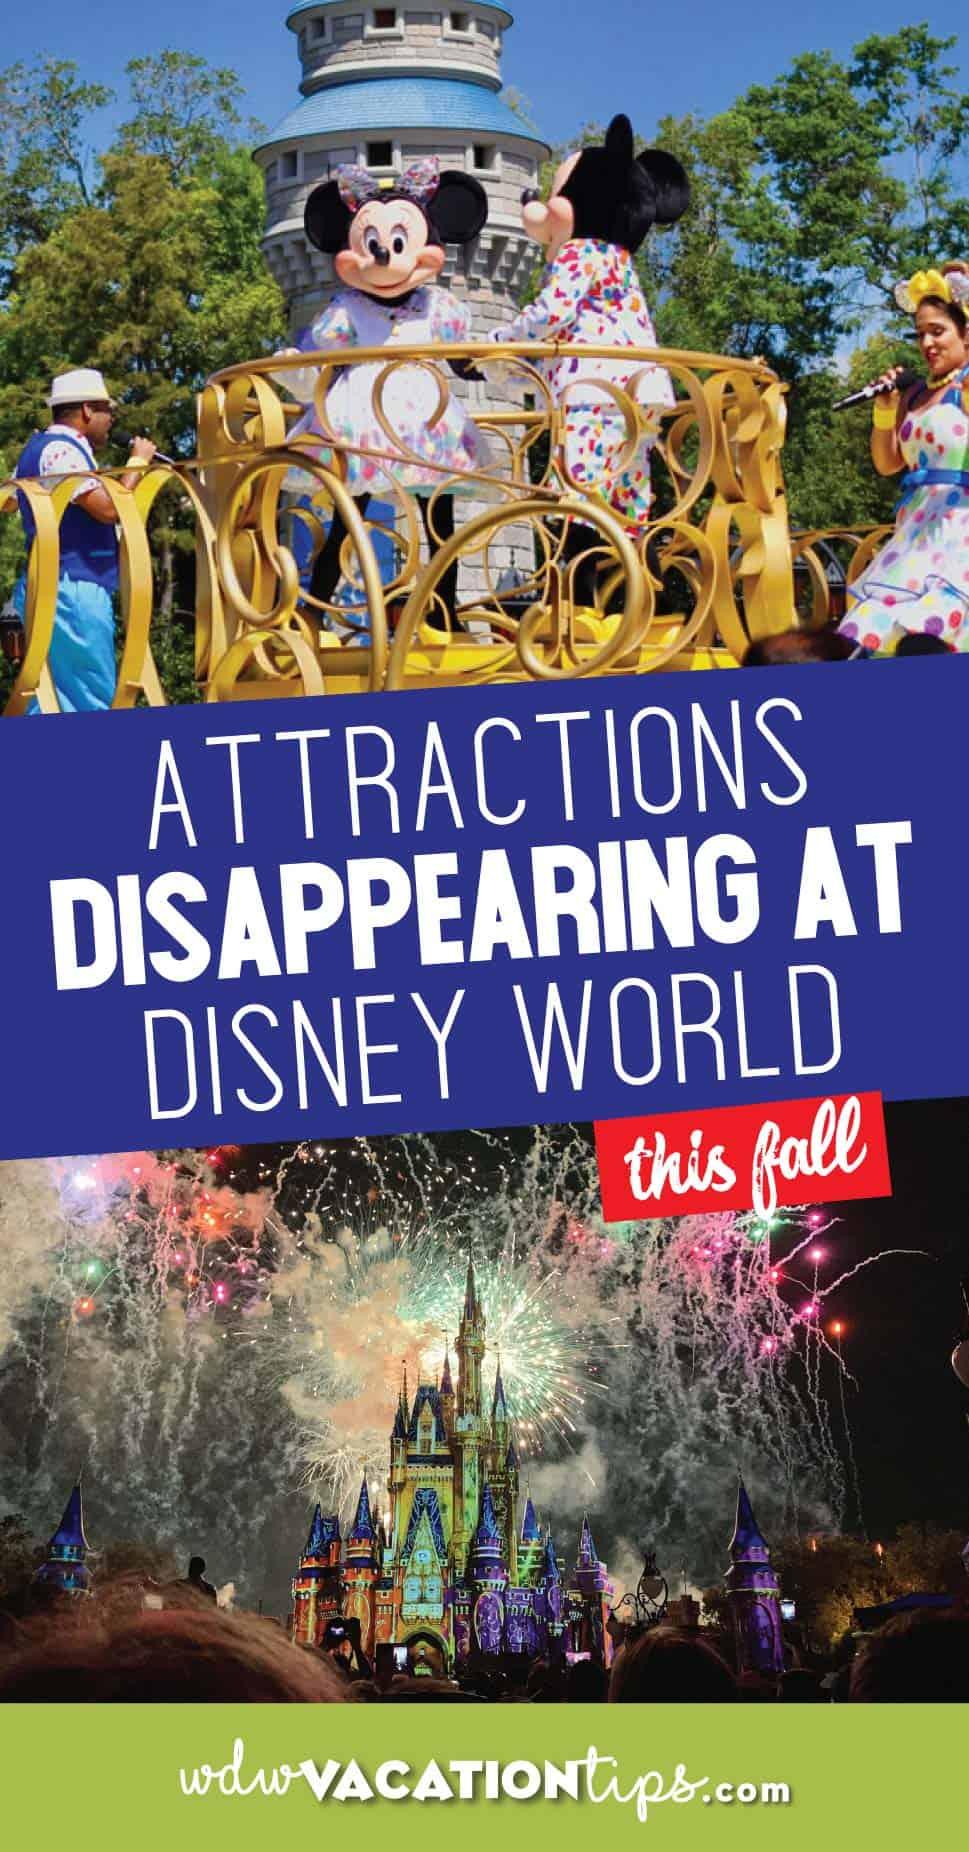 Rides Disappearing this Fall at Disney World